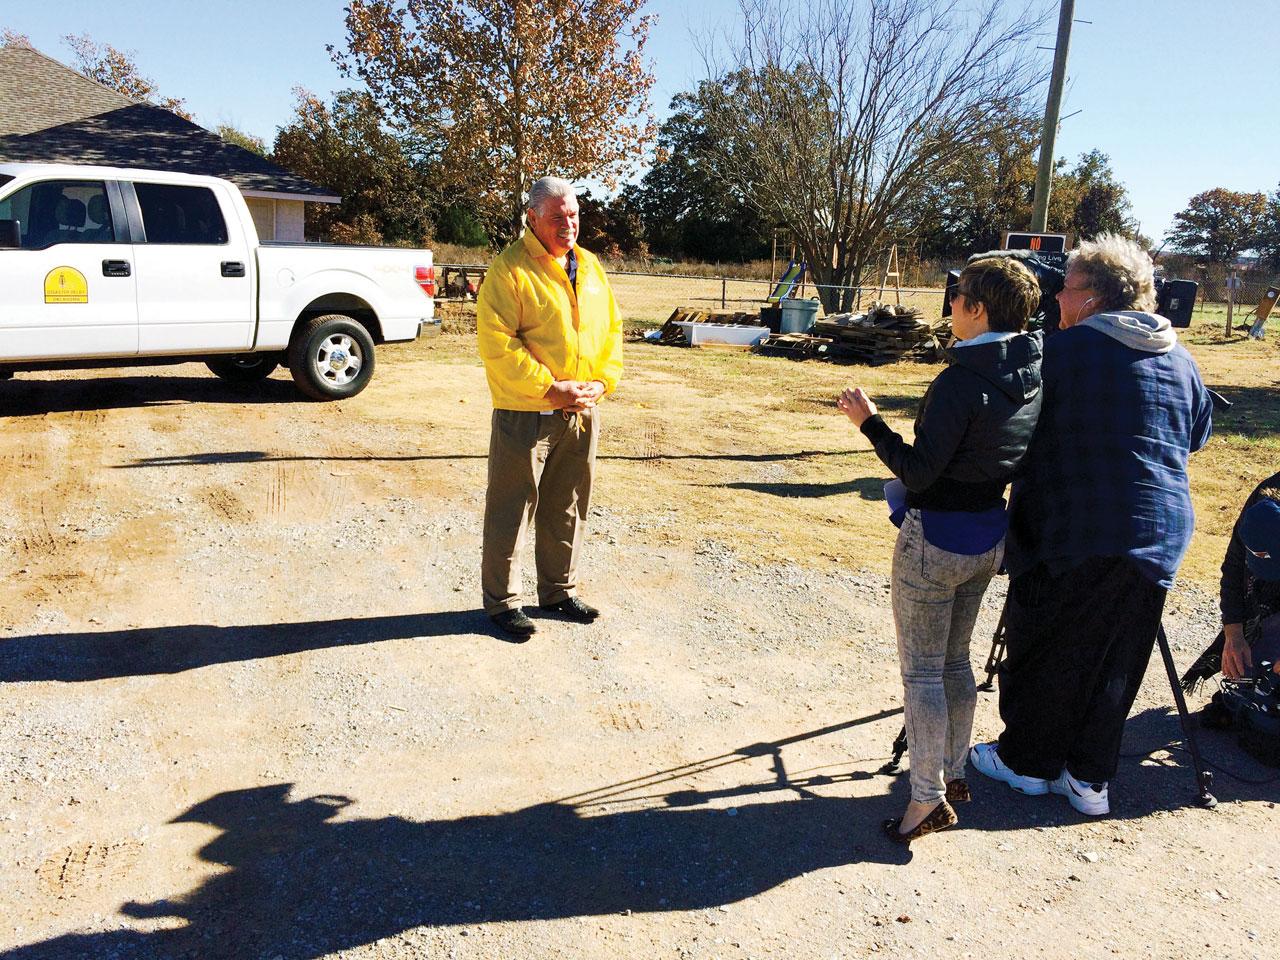 Oklahoma DR makes national spotlight on Fox News